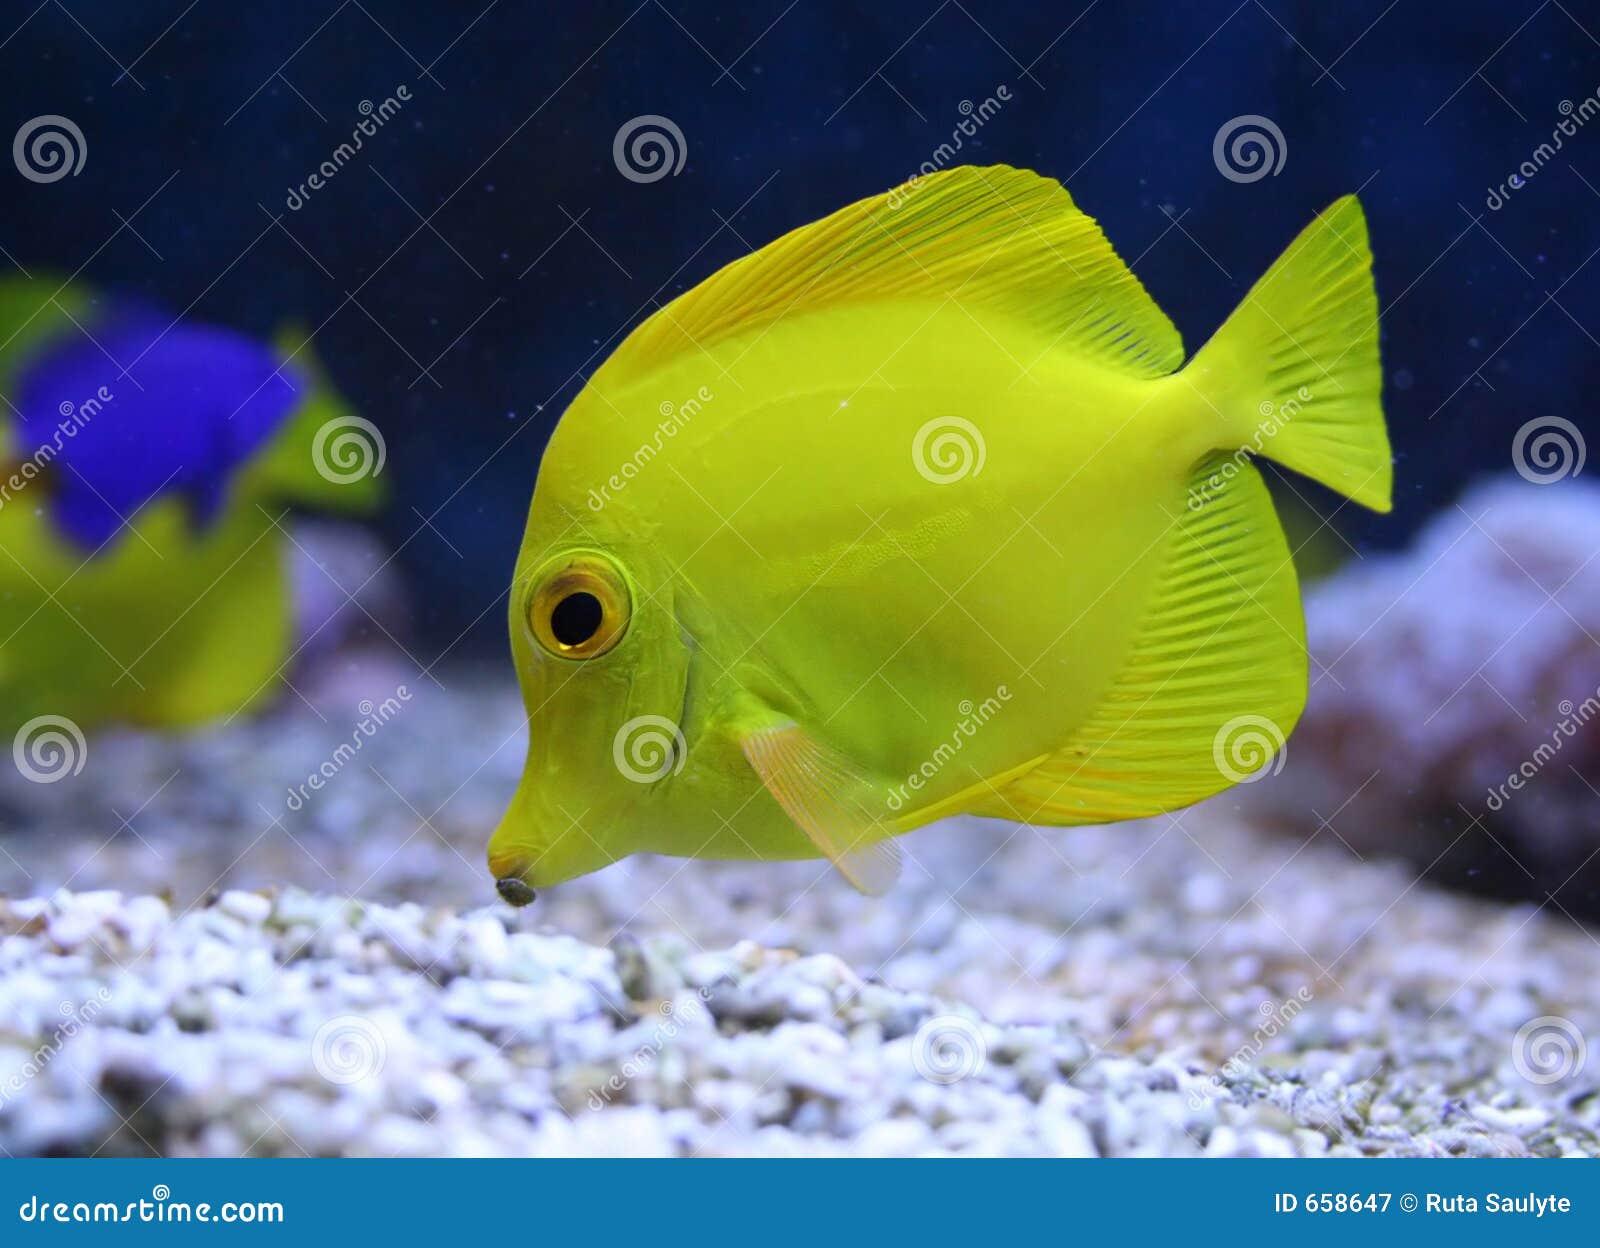 aquarium fish royalty free stock photography image 658647